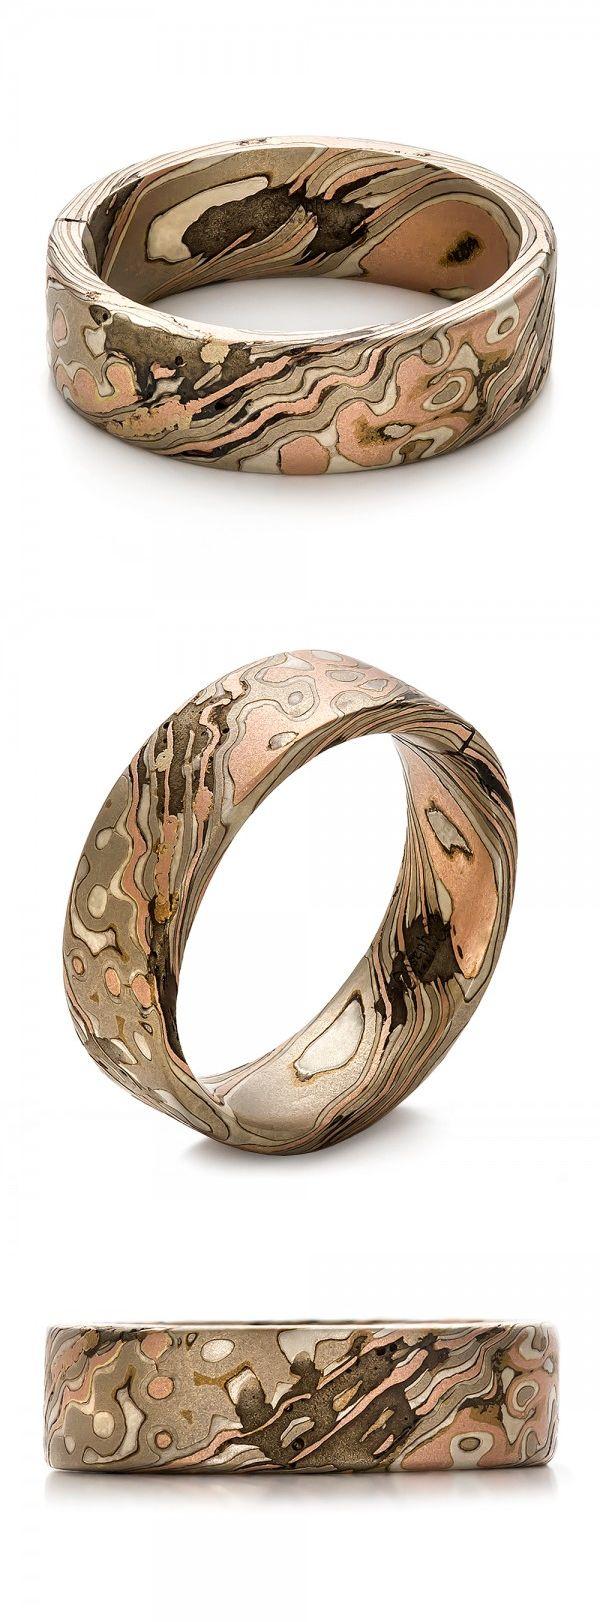 best custom jewelry images on pinterest